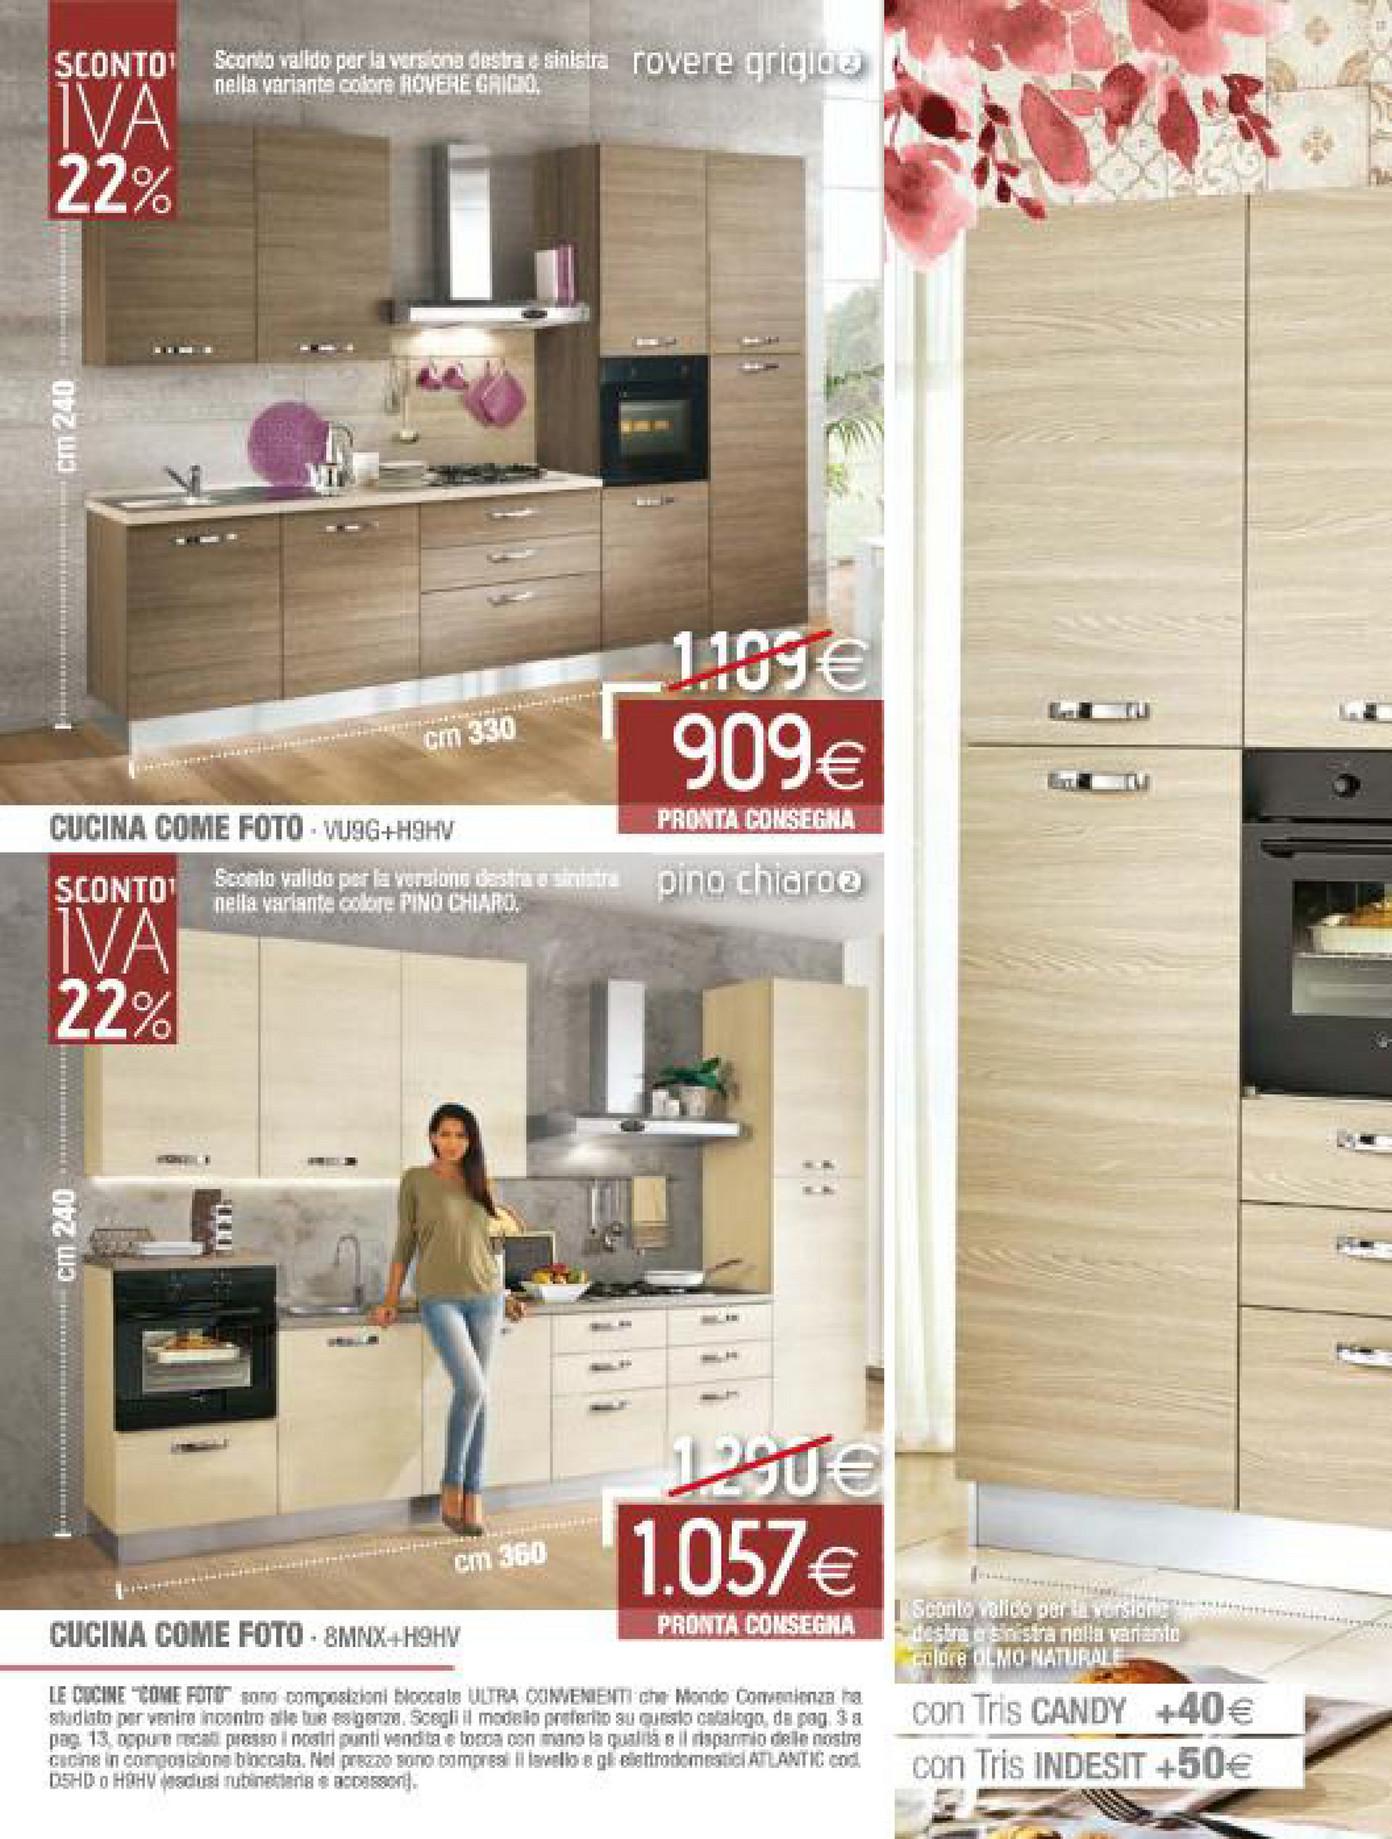 arredamenti mondo convenienza cucine mobili convenienza cucine ...